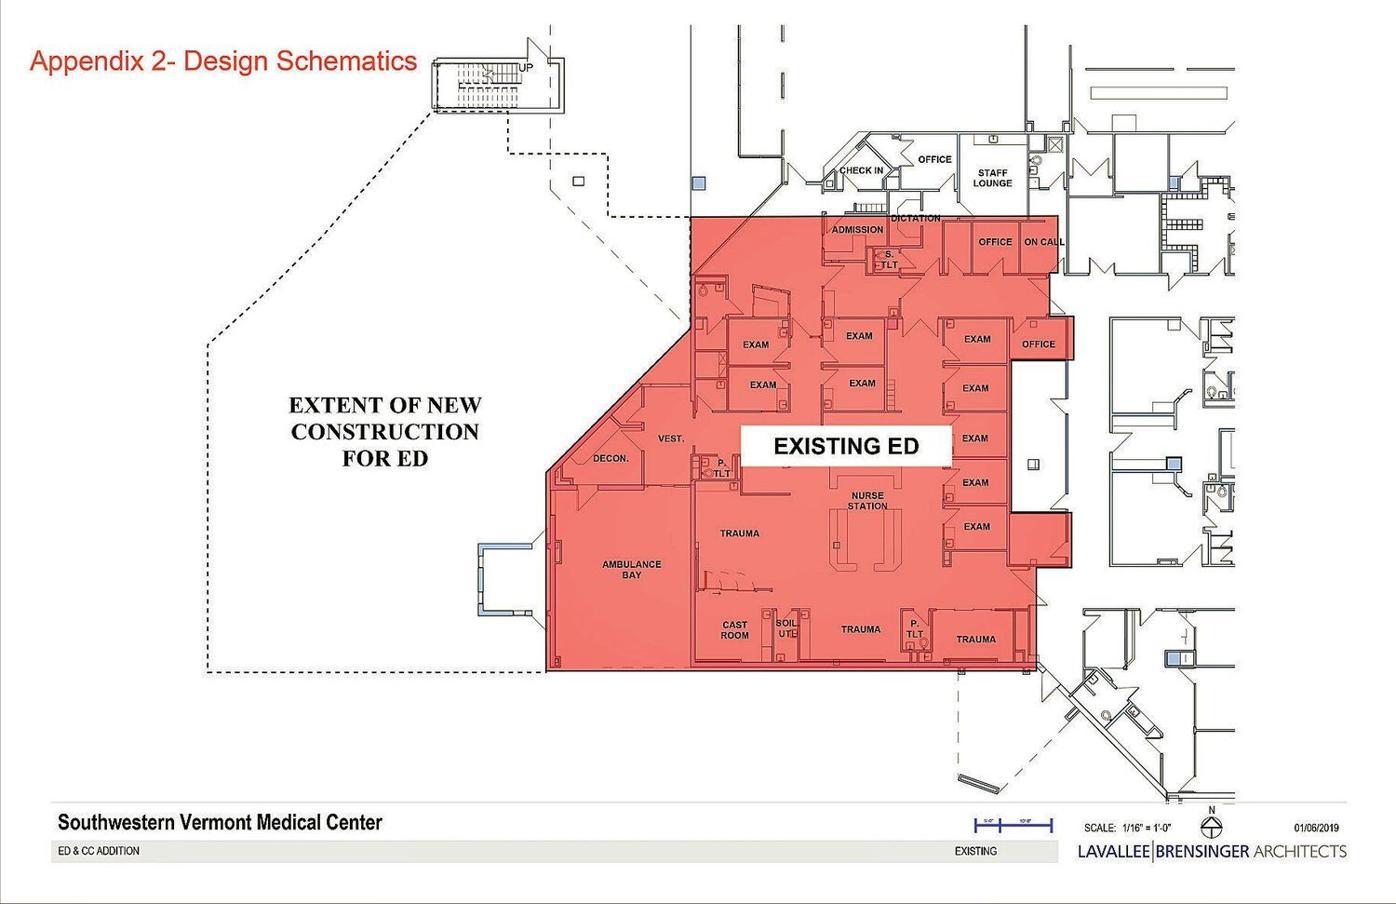 Medical center plans $25.8M expansion